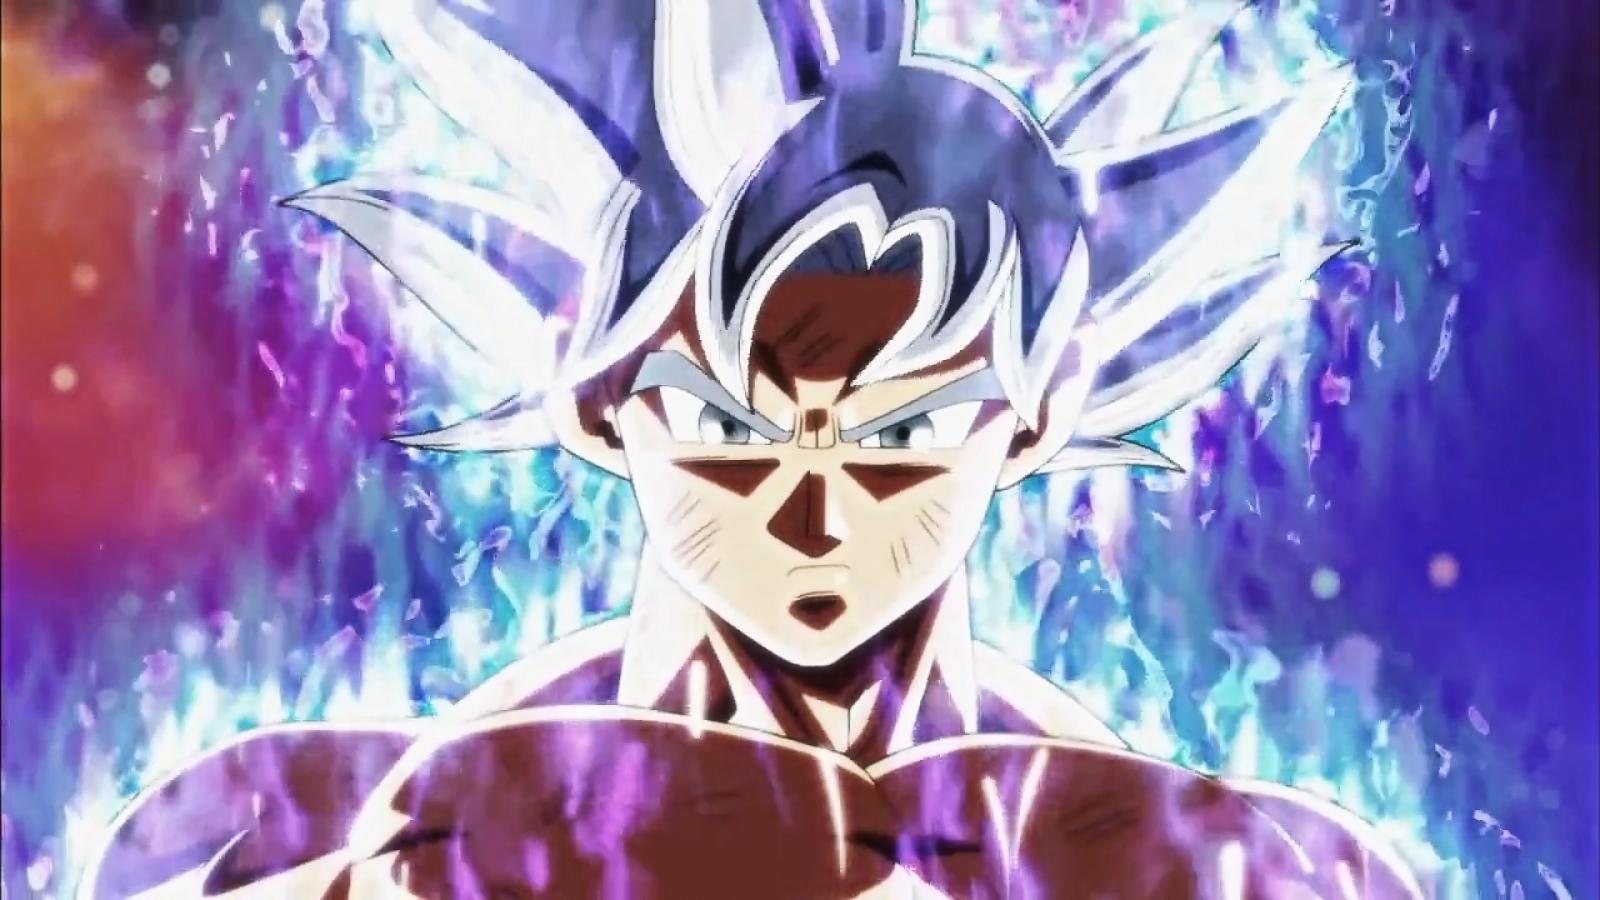 Wallpaper son goku ultra instinct goku mastered ultra - Goku ultra instinct mastered wallpaper ...